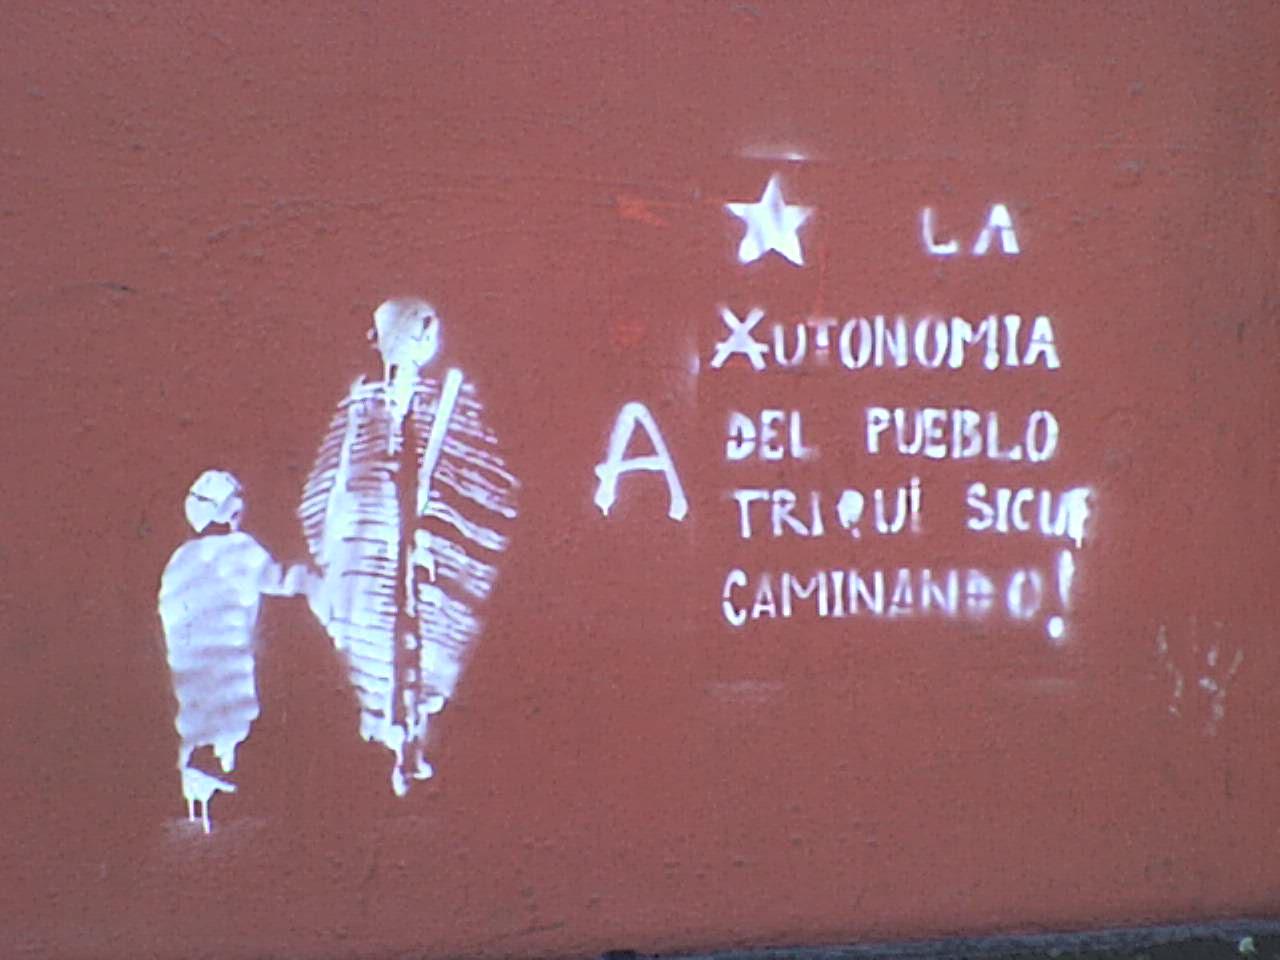 Justicia para San Juan Copala, municipio autónomo